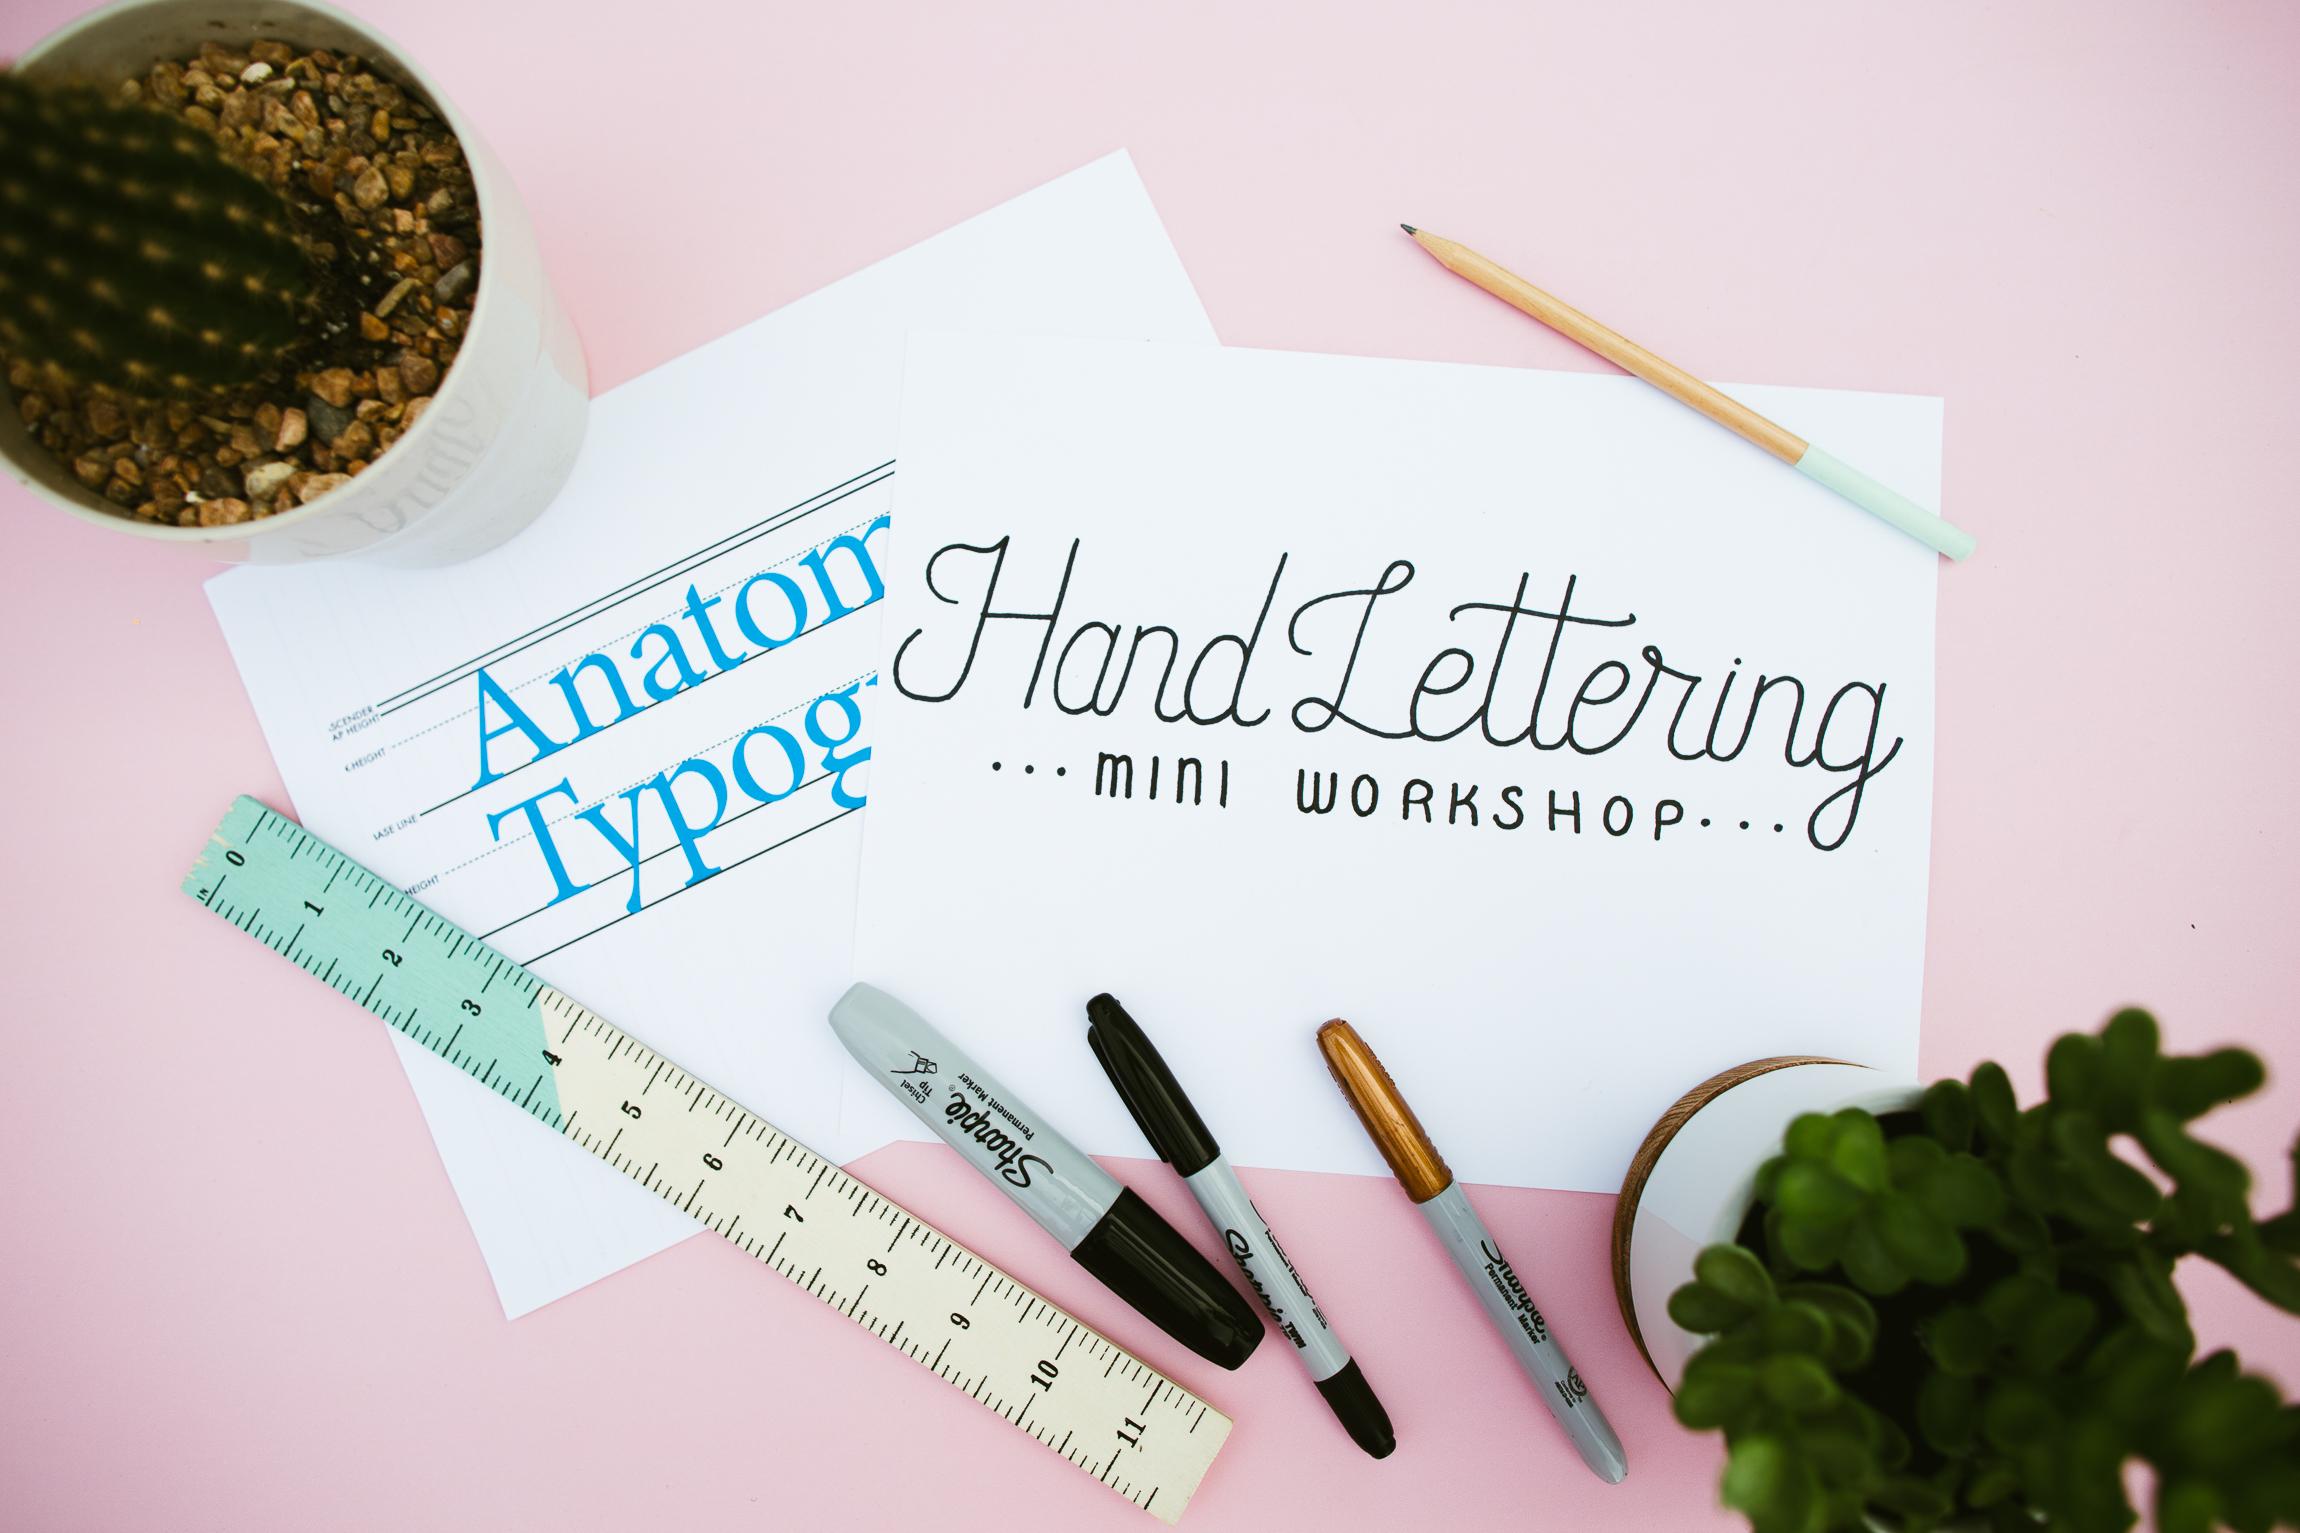 East Austin Studio Tour Hand Lettering Mini Workshop